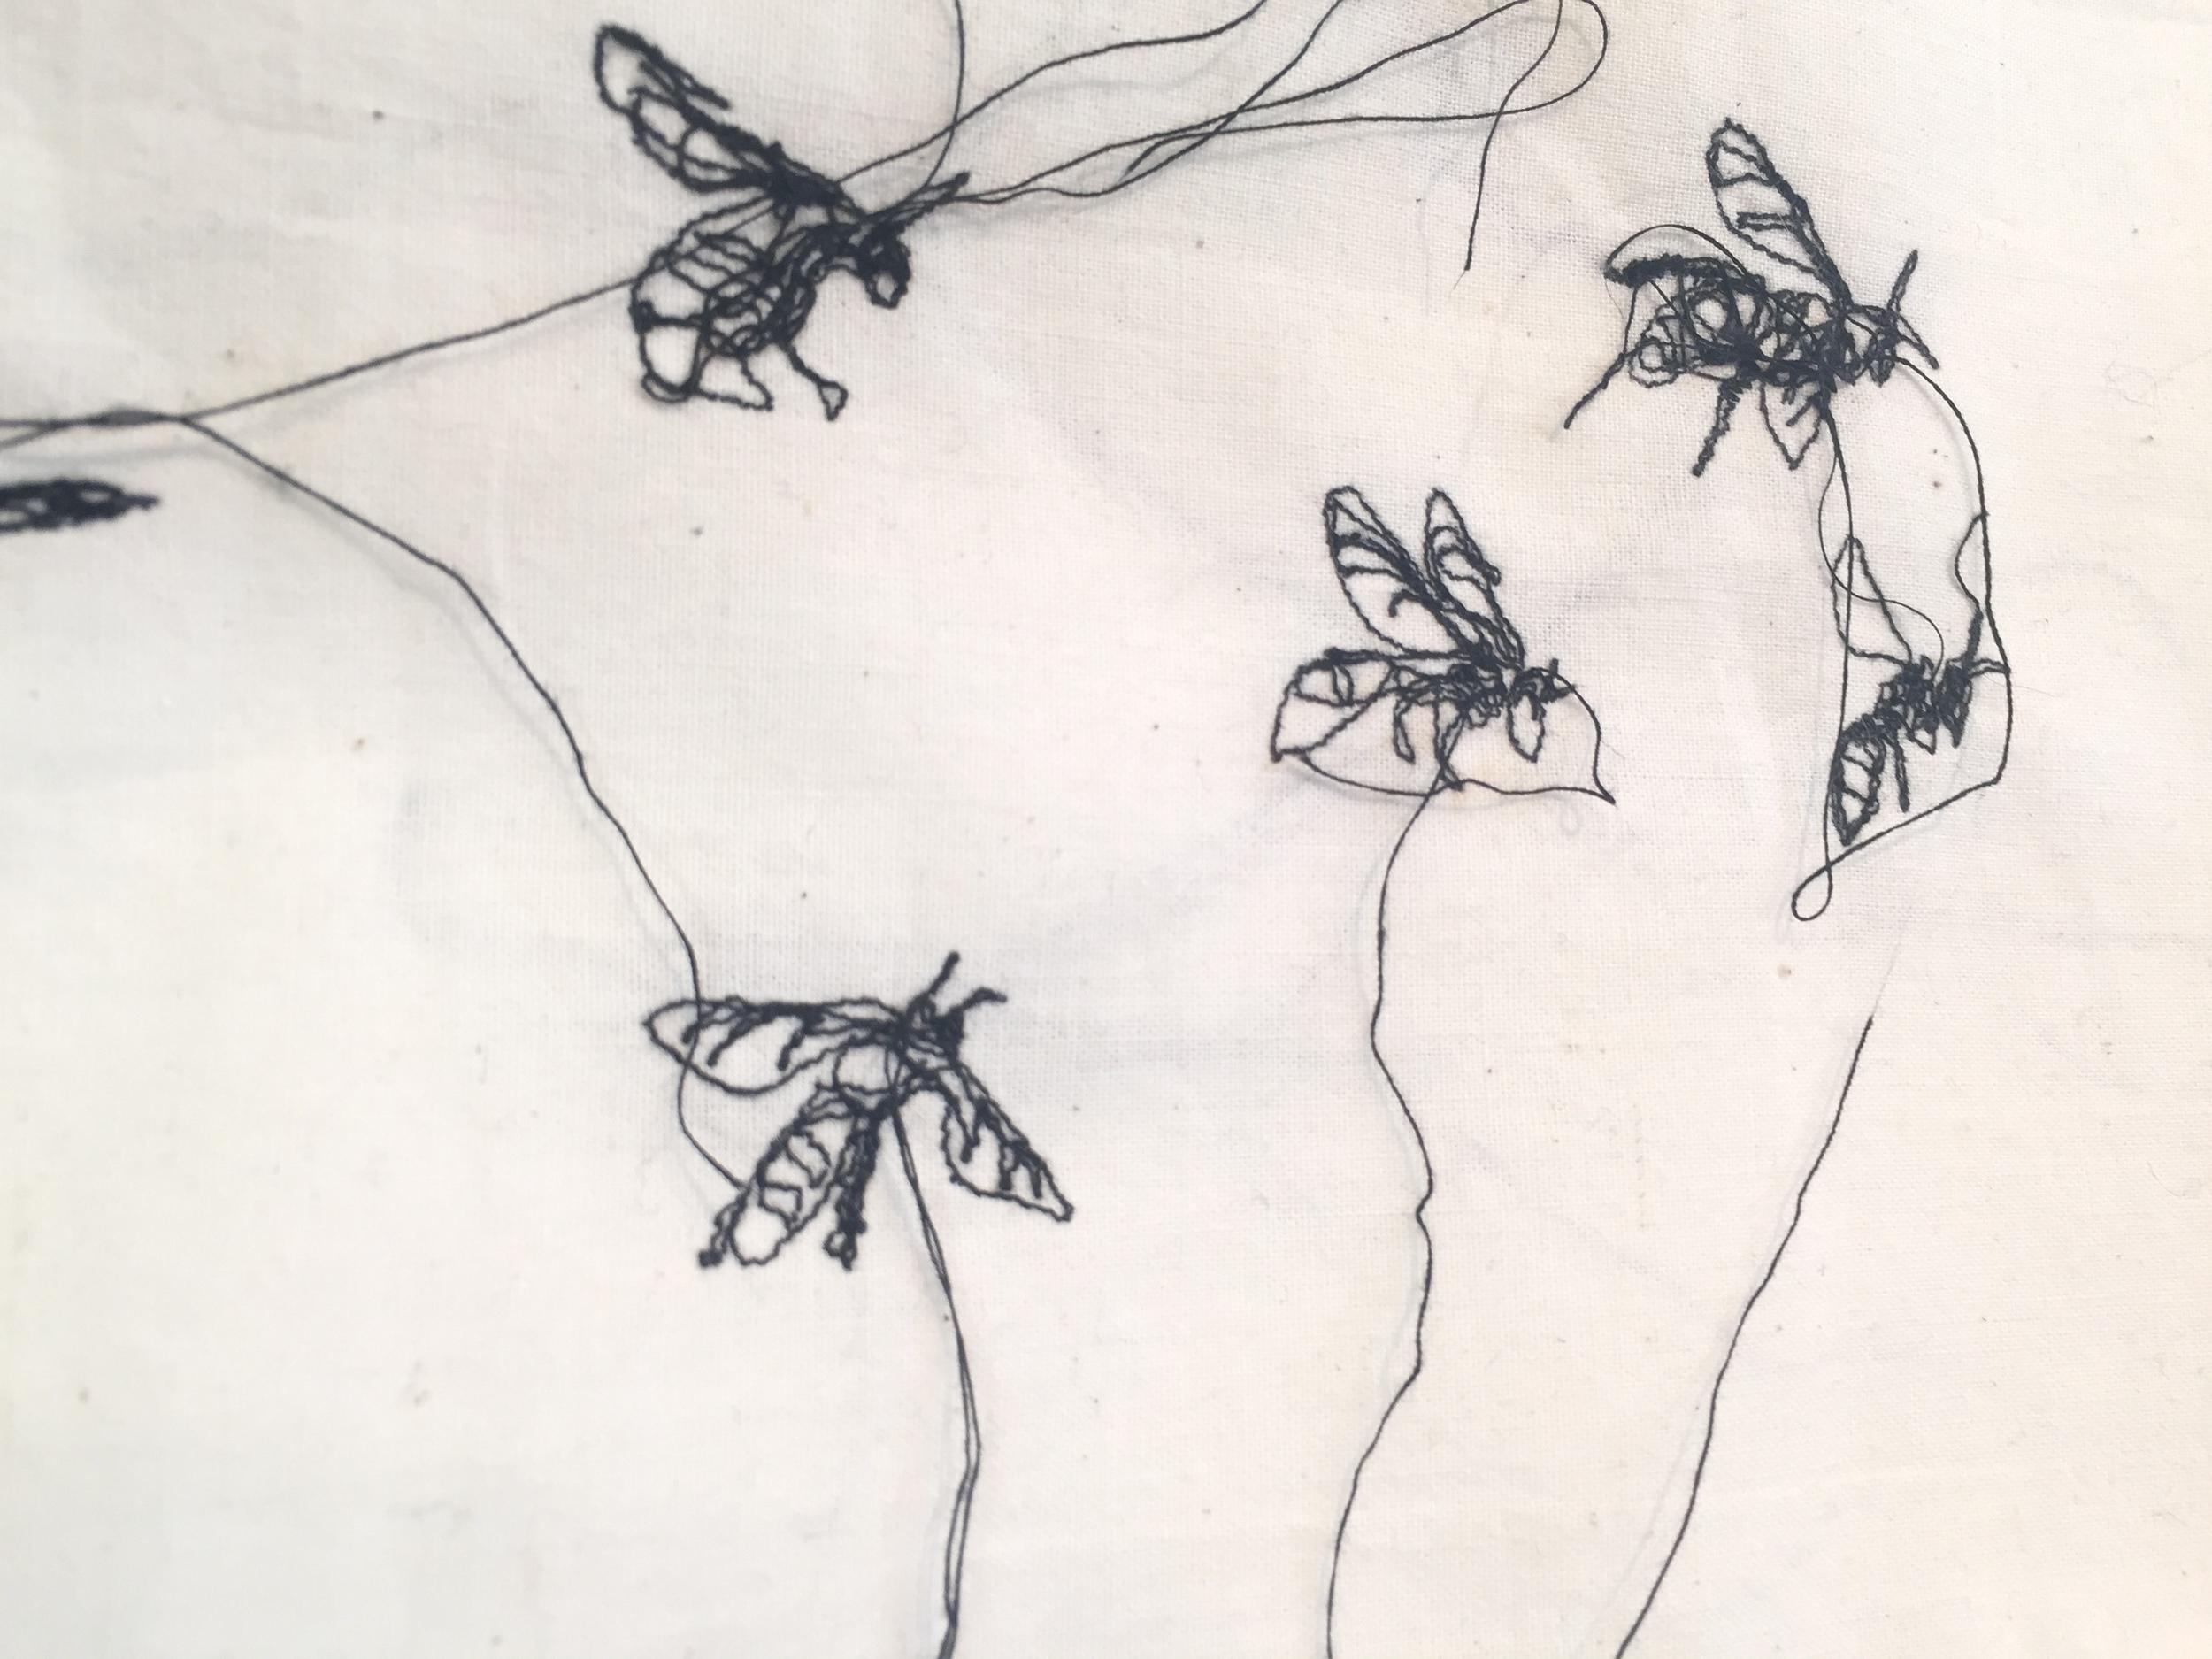 Swarm (detail), 2016